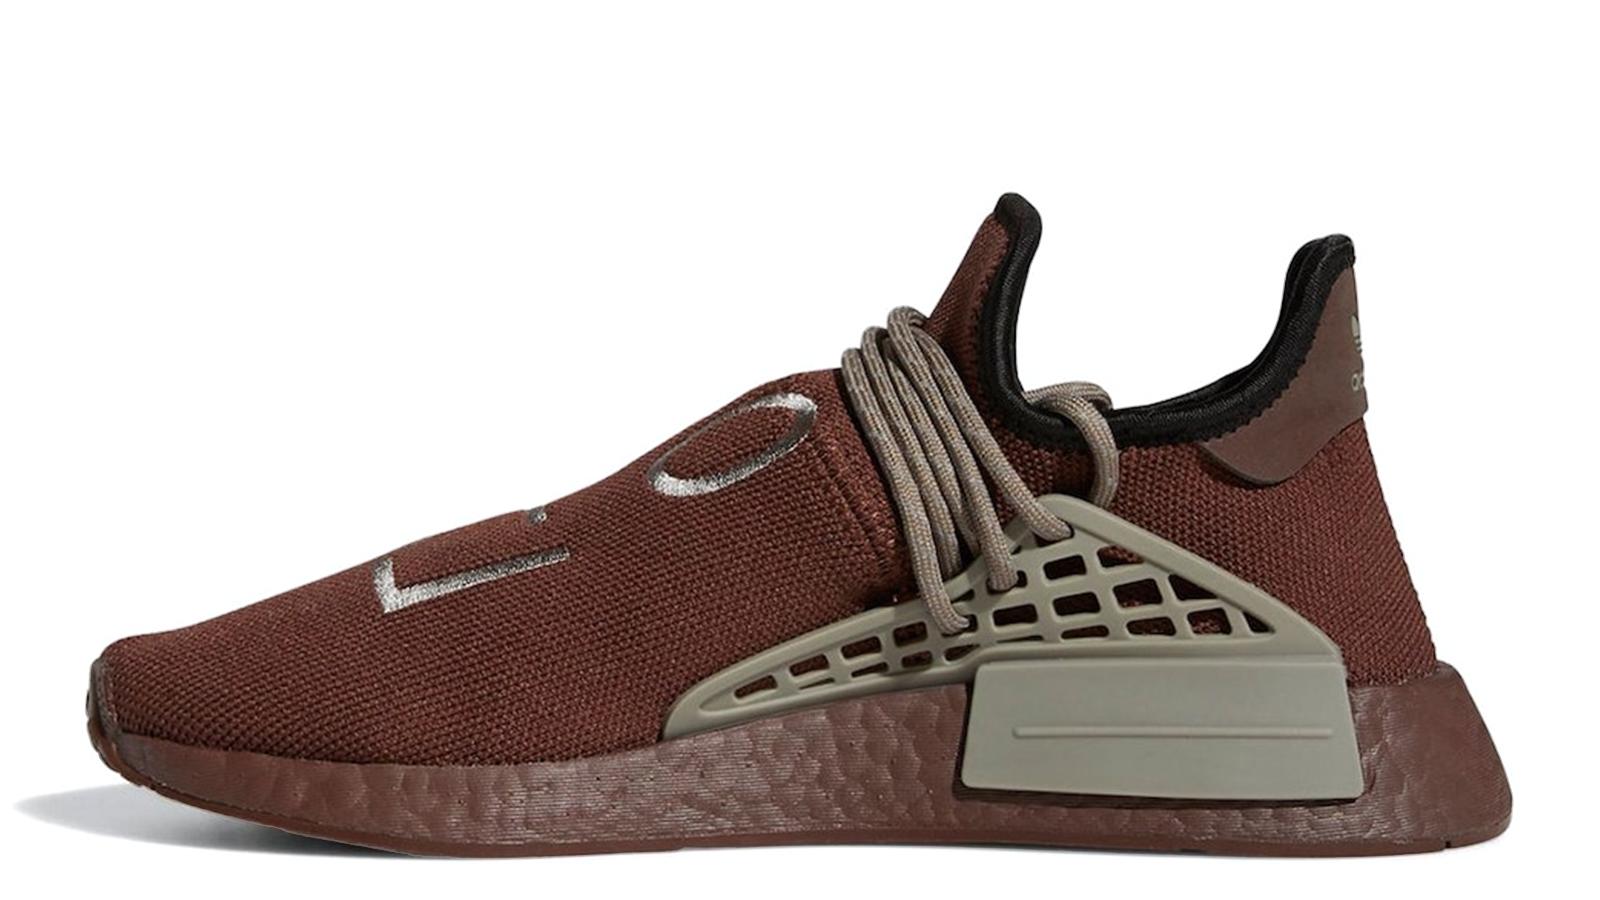 Pharrell x adidas NMD Hu Chocolate GY0090